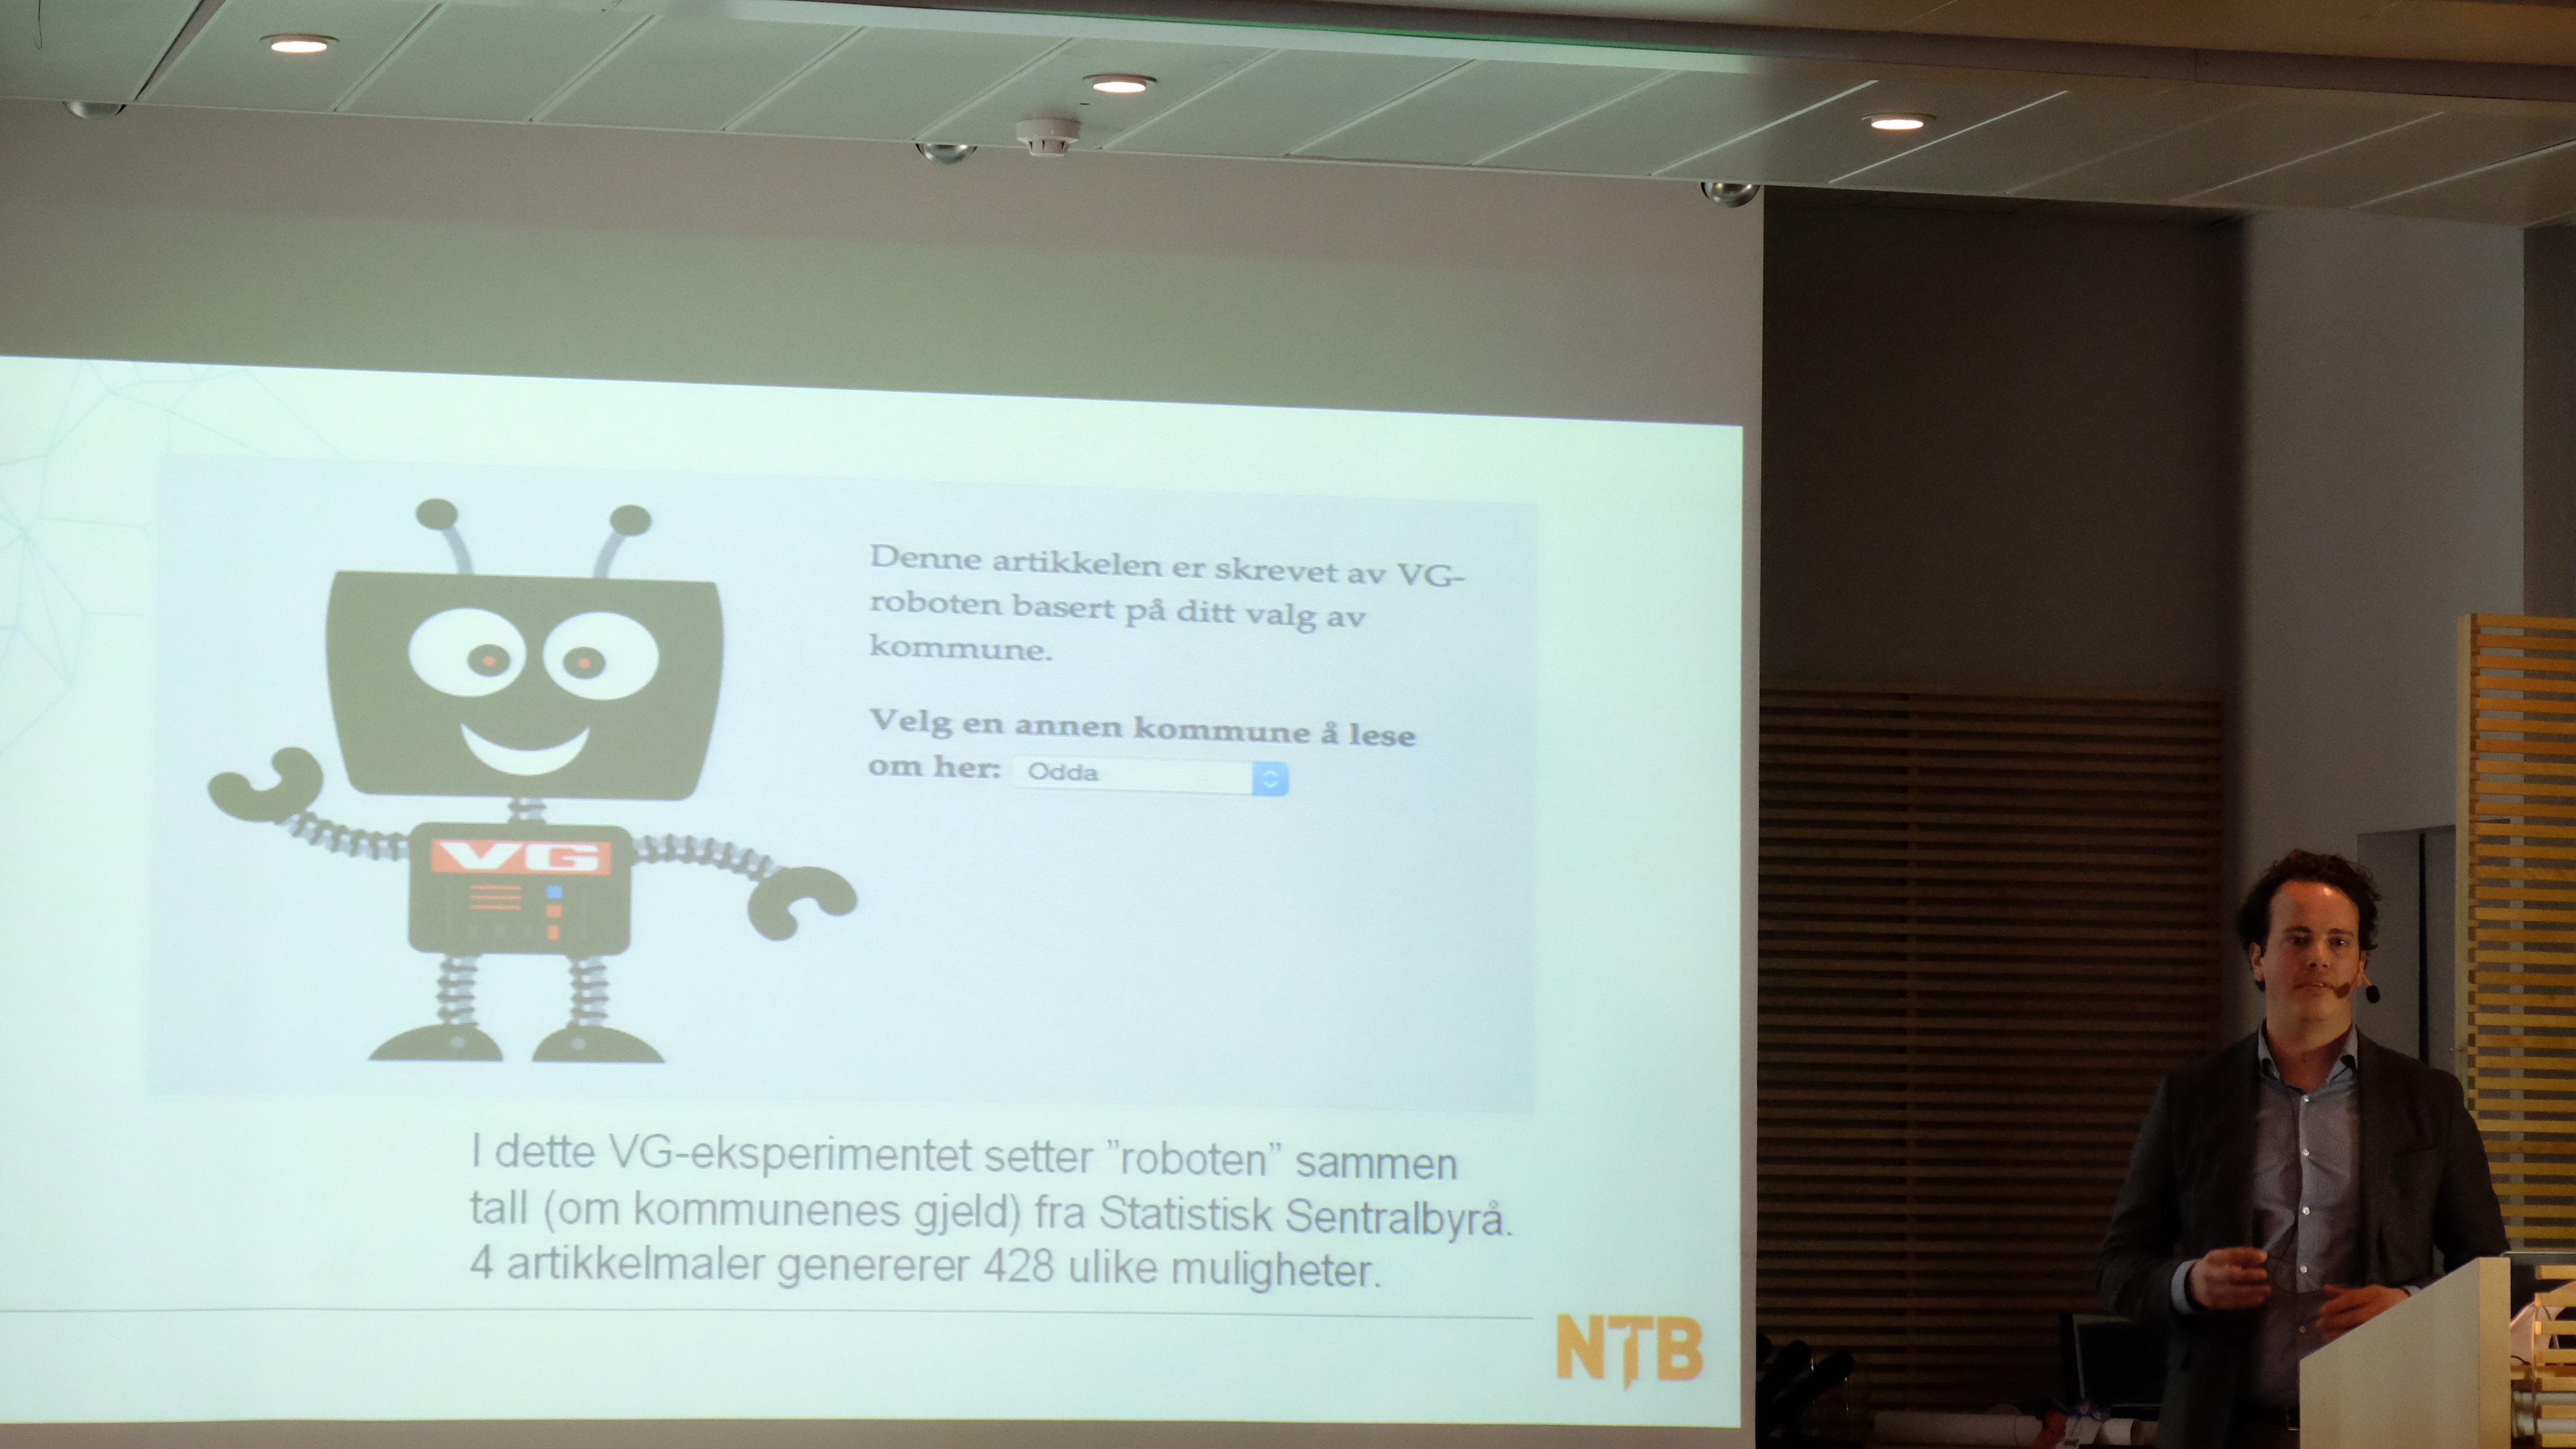 Også VG har en enkel journalistrobot.